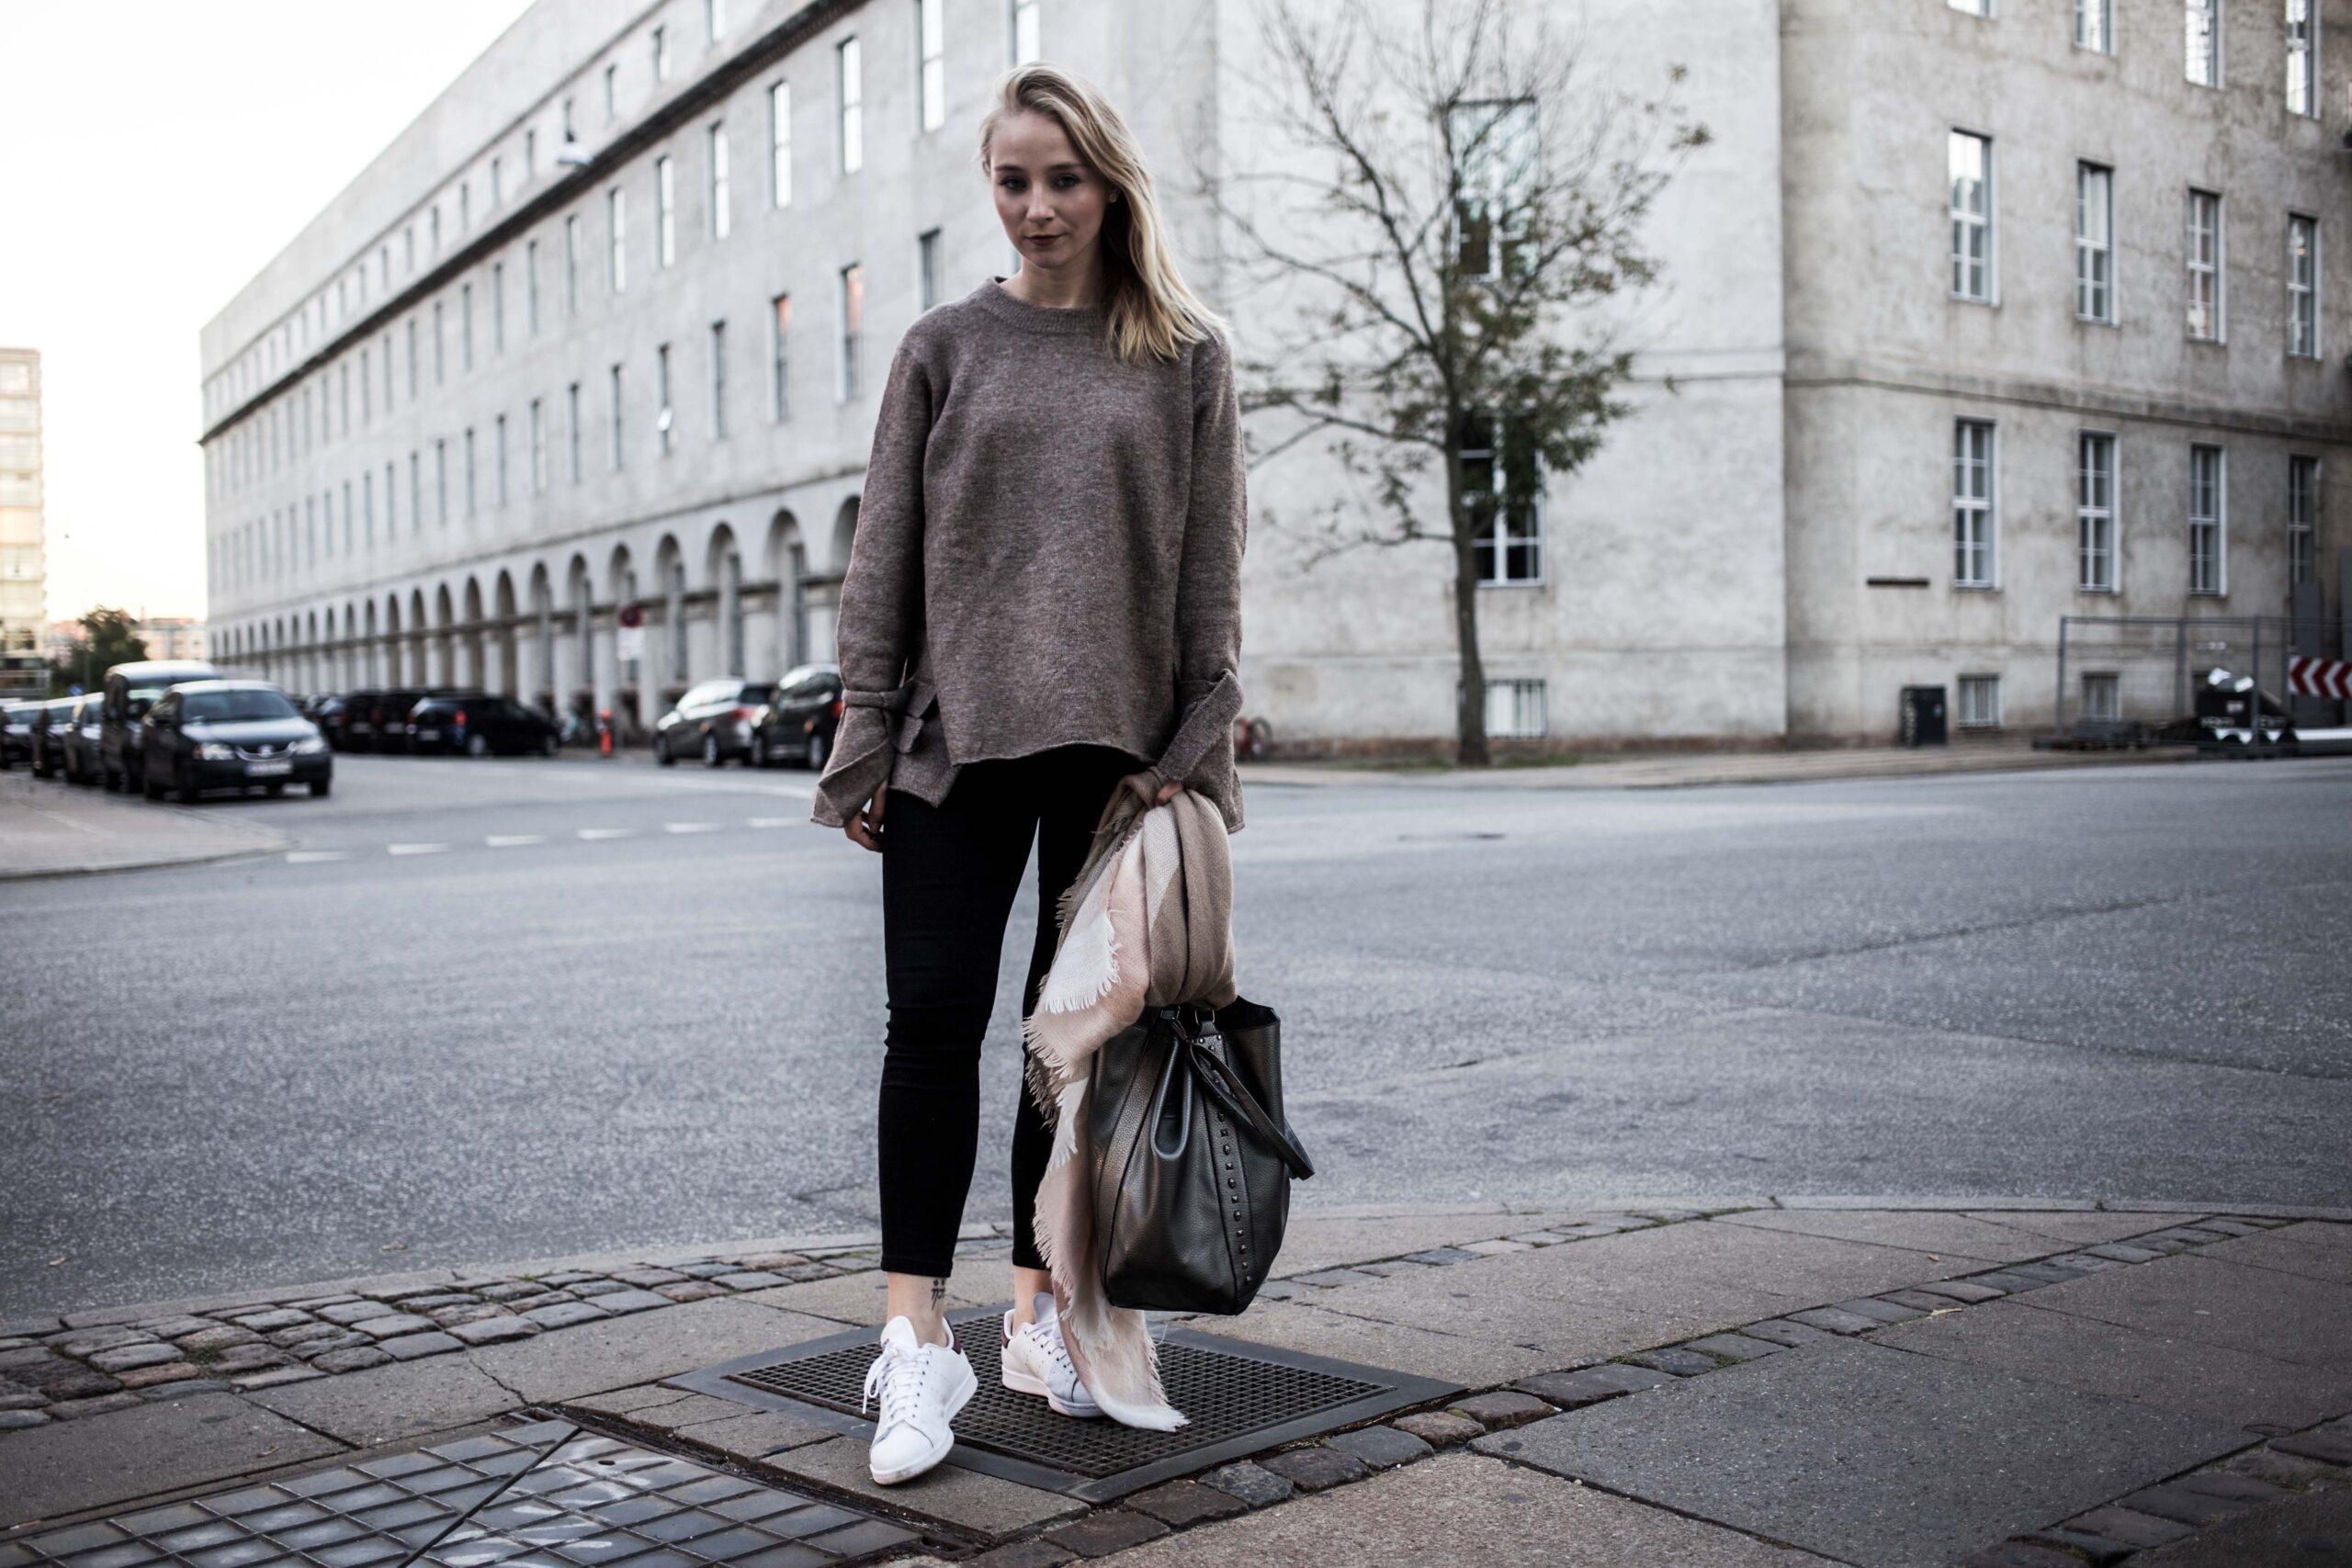 herbst-outfit-kopenhagen-basic-look-travelblog-fashionblog_5459-1